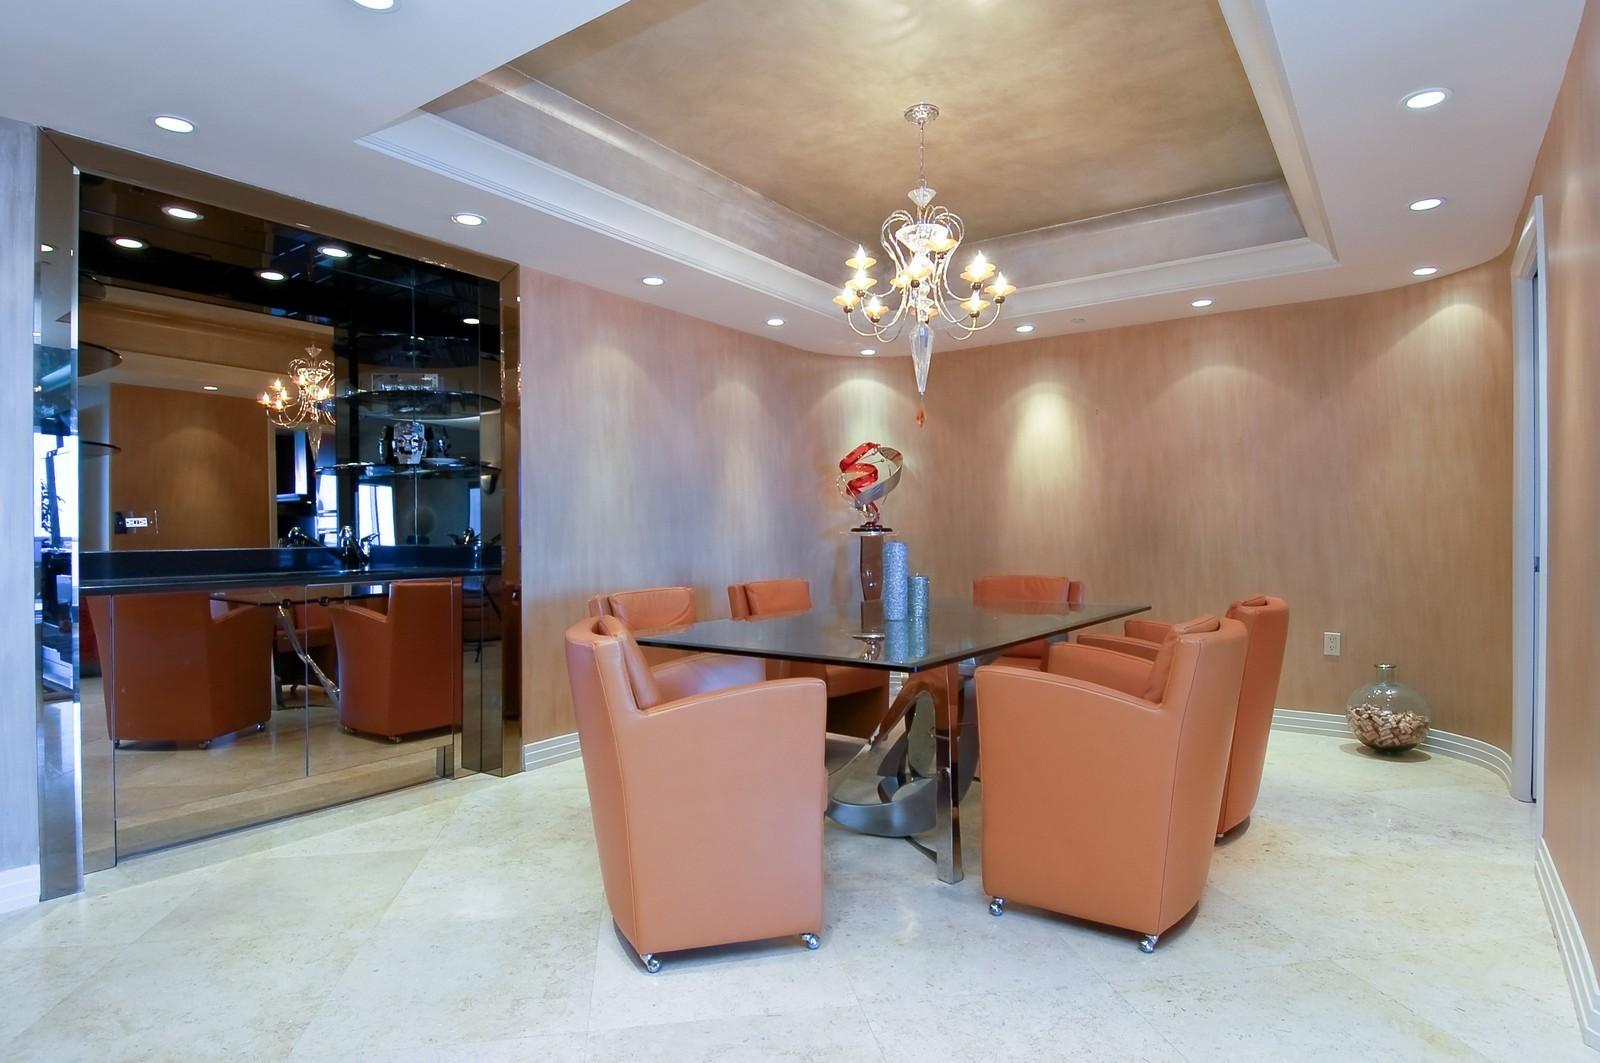 Real Estate Photography - 1600 S Ocean Blvd, Apt 802, Pompano Beach, FL, 33062 - Dining Room